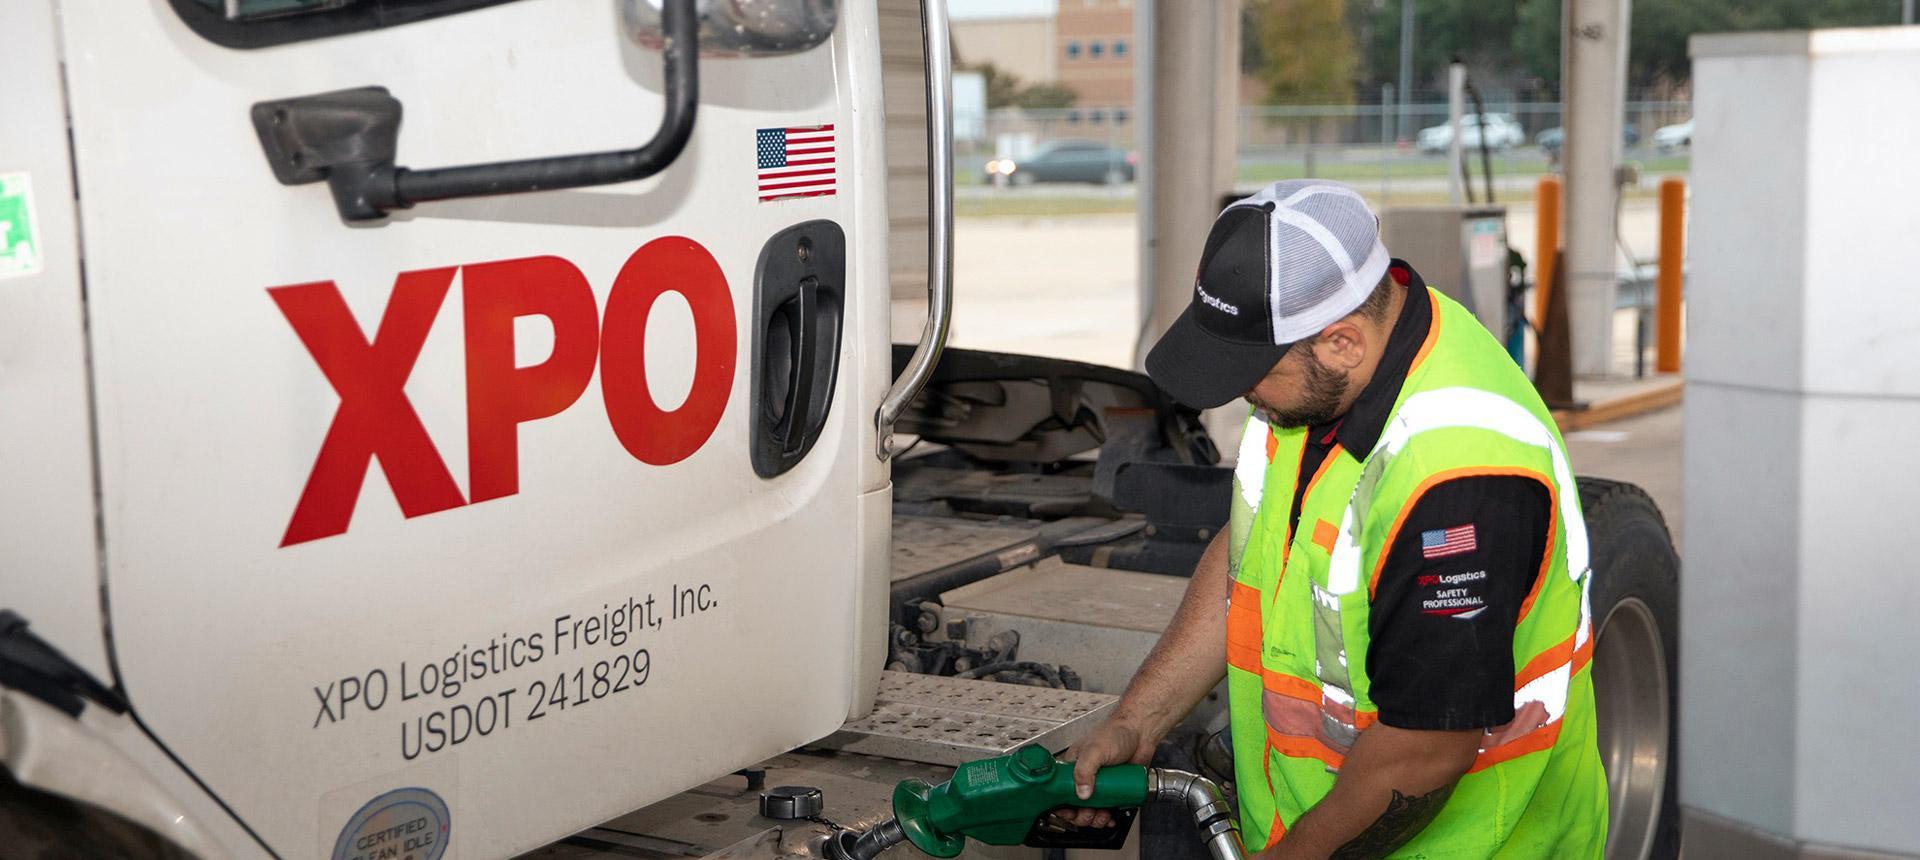 XPO employee filling truck